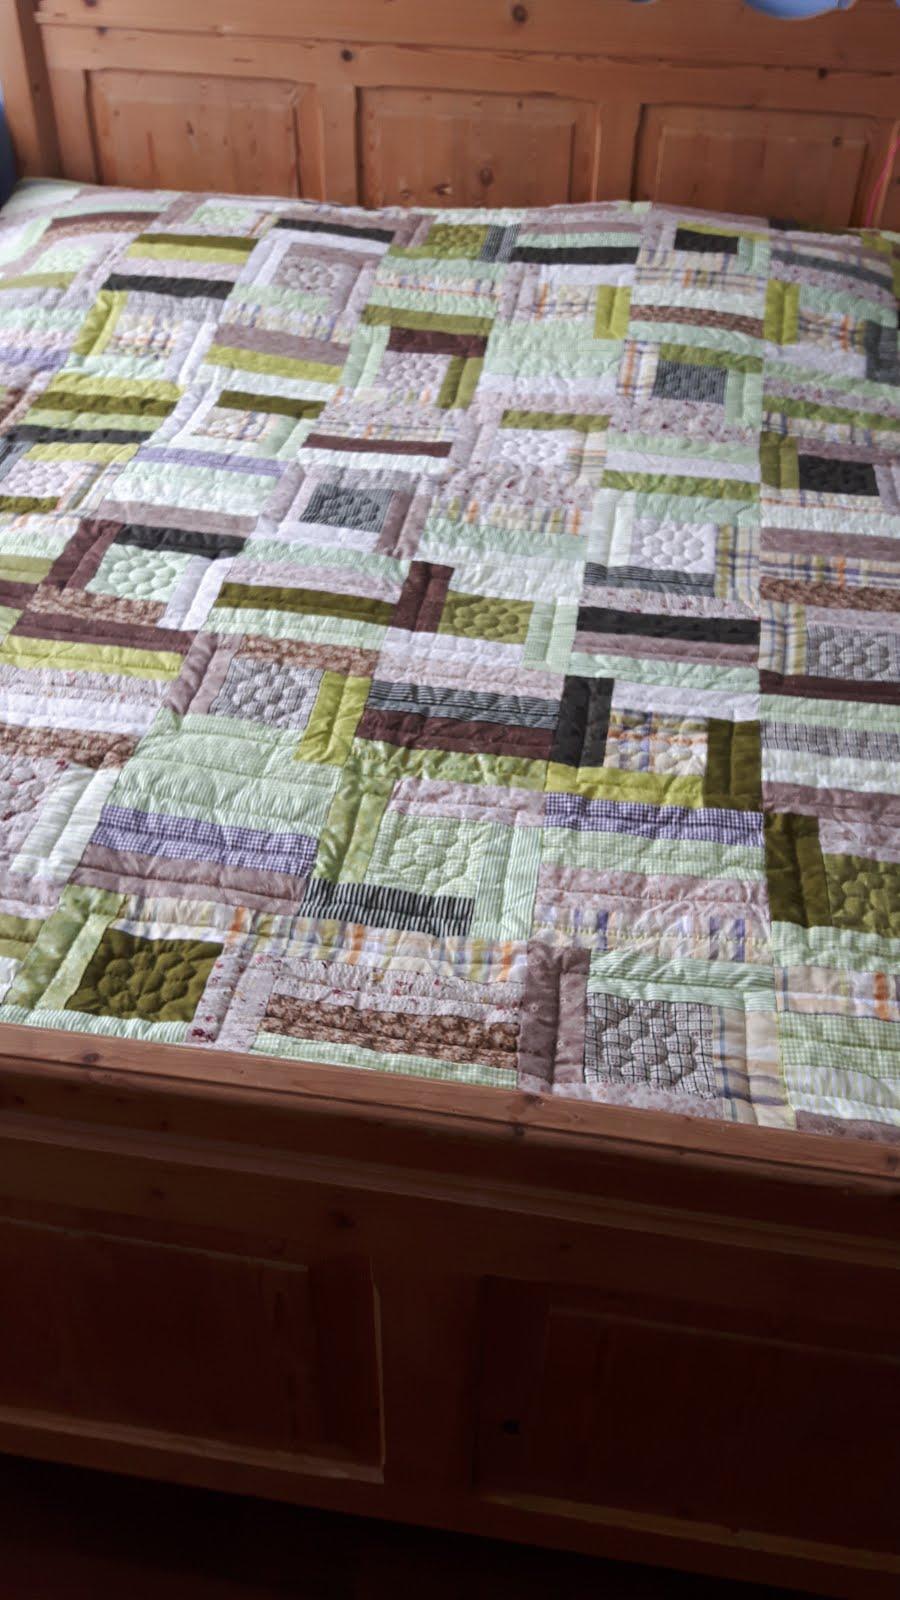 Groene blokken quilt